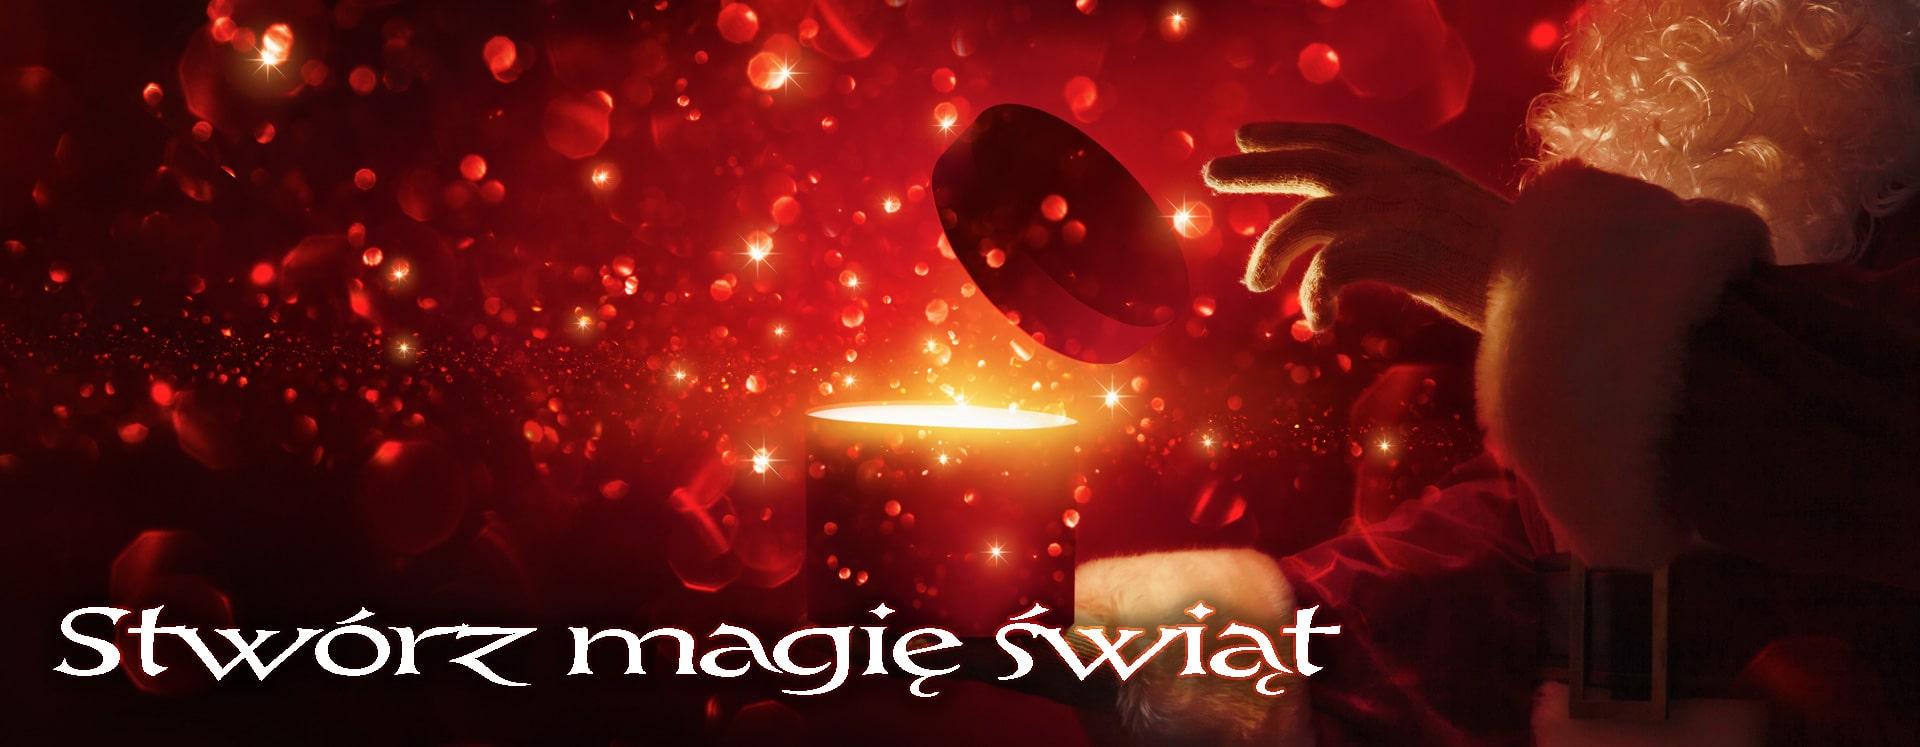 magia-swiat-min